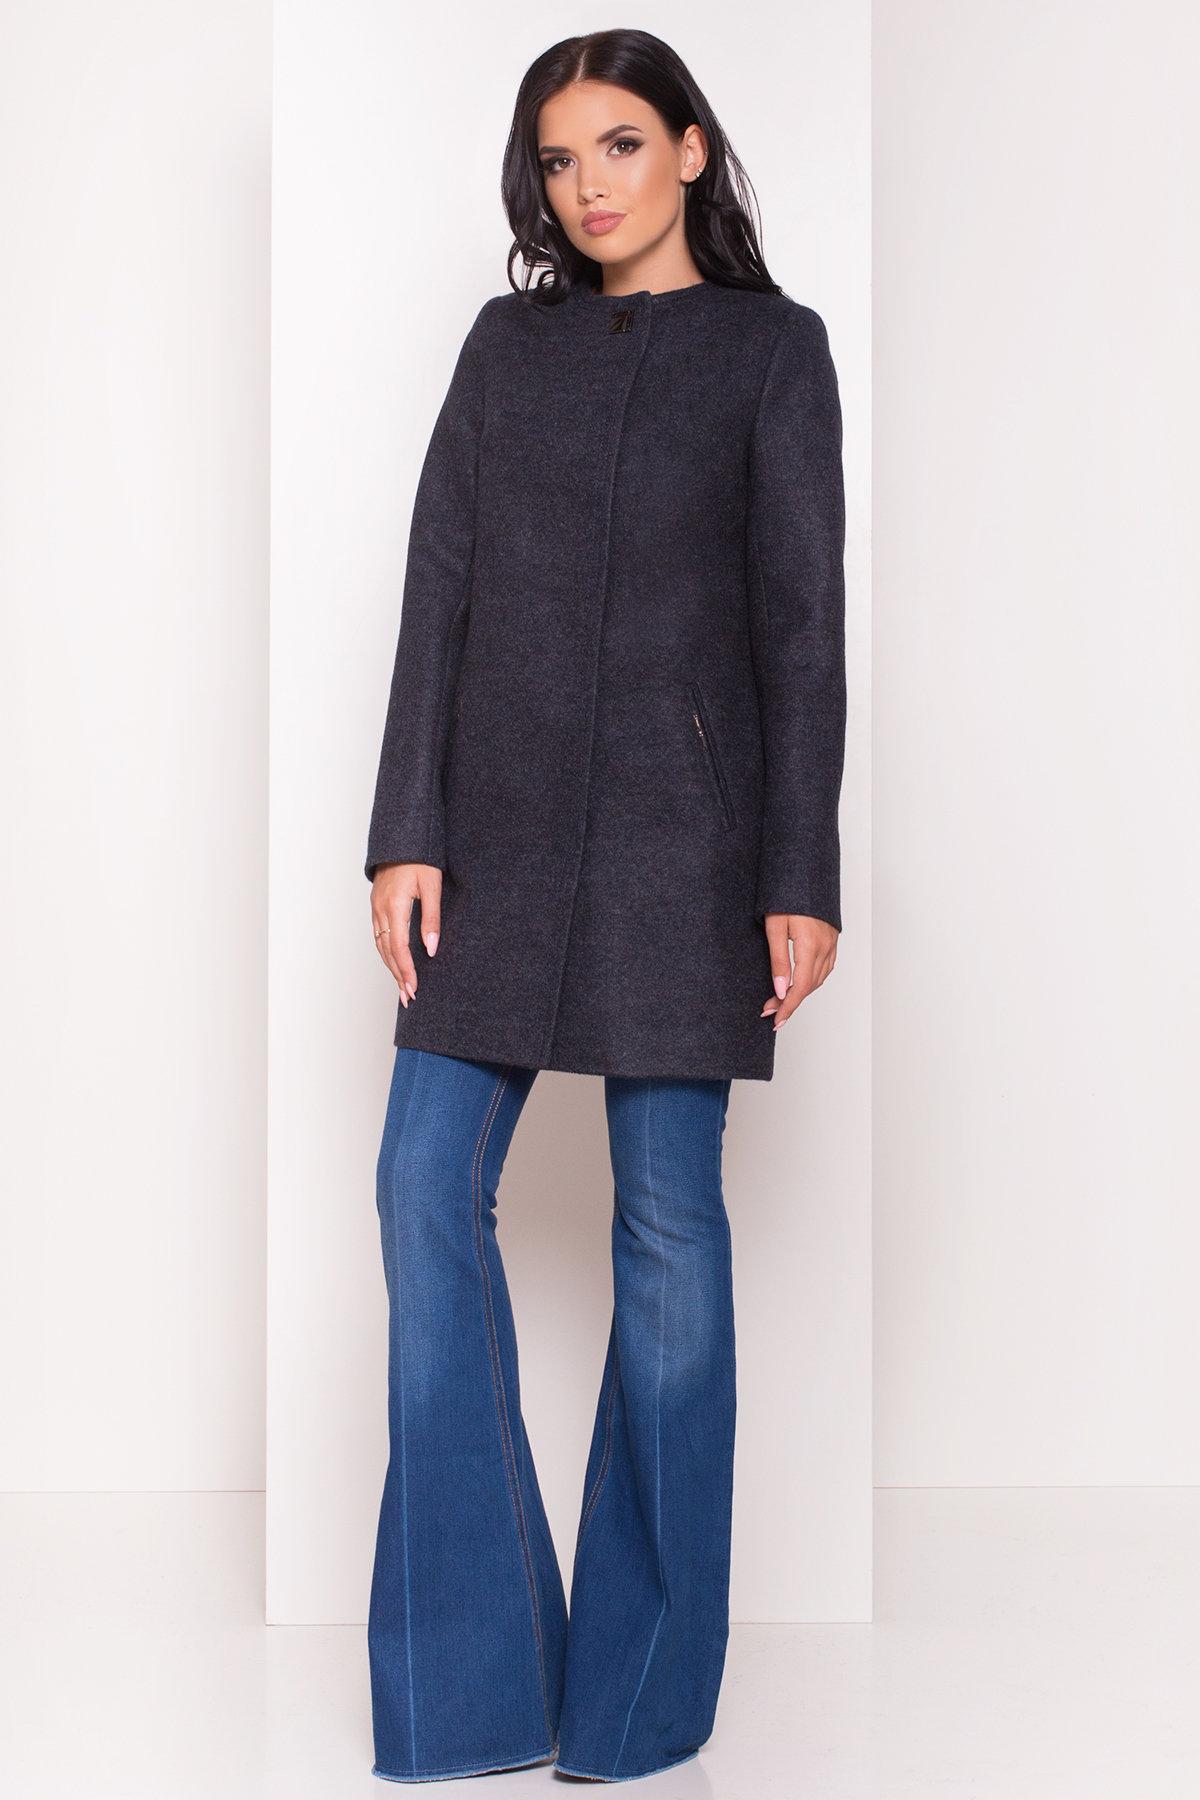 Демисезонное пальто Ферран 5369 АРТ. 36594 Цвет: Темно-синий - фото 3, интернет магазин tm-modus.ru